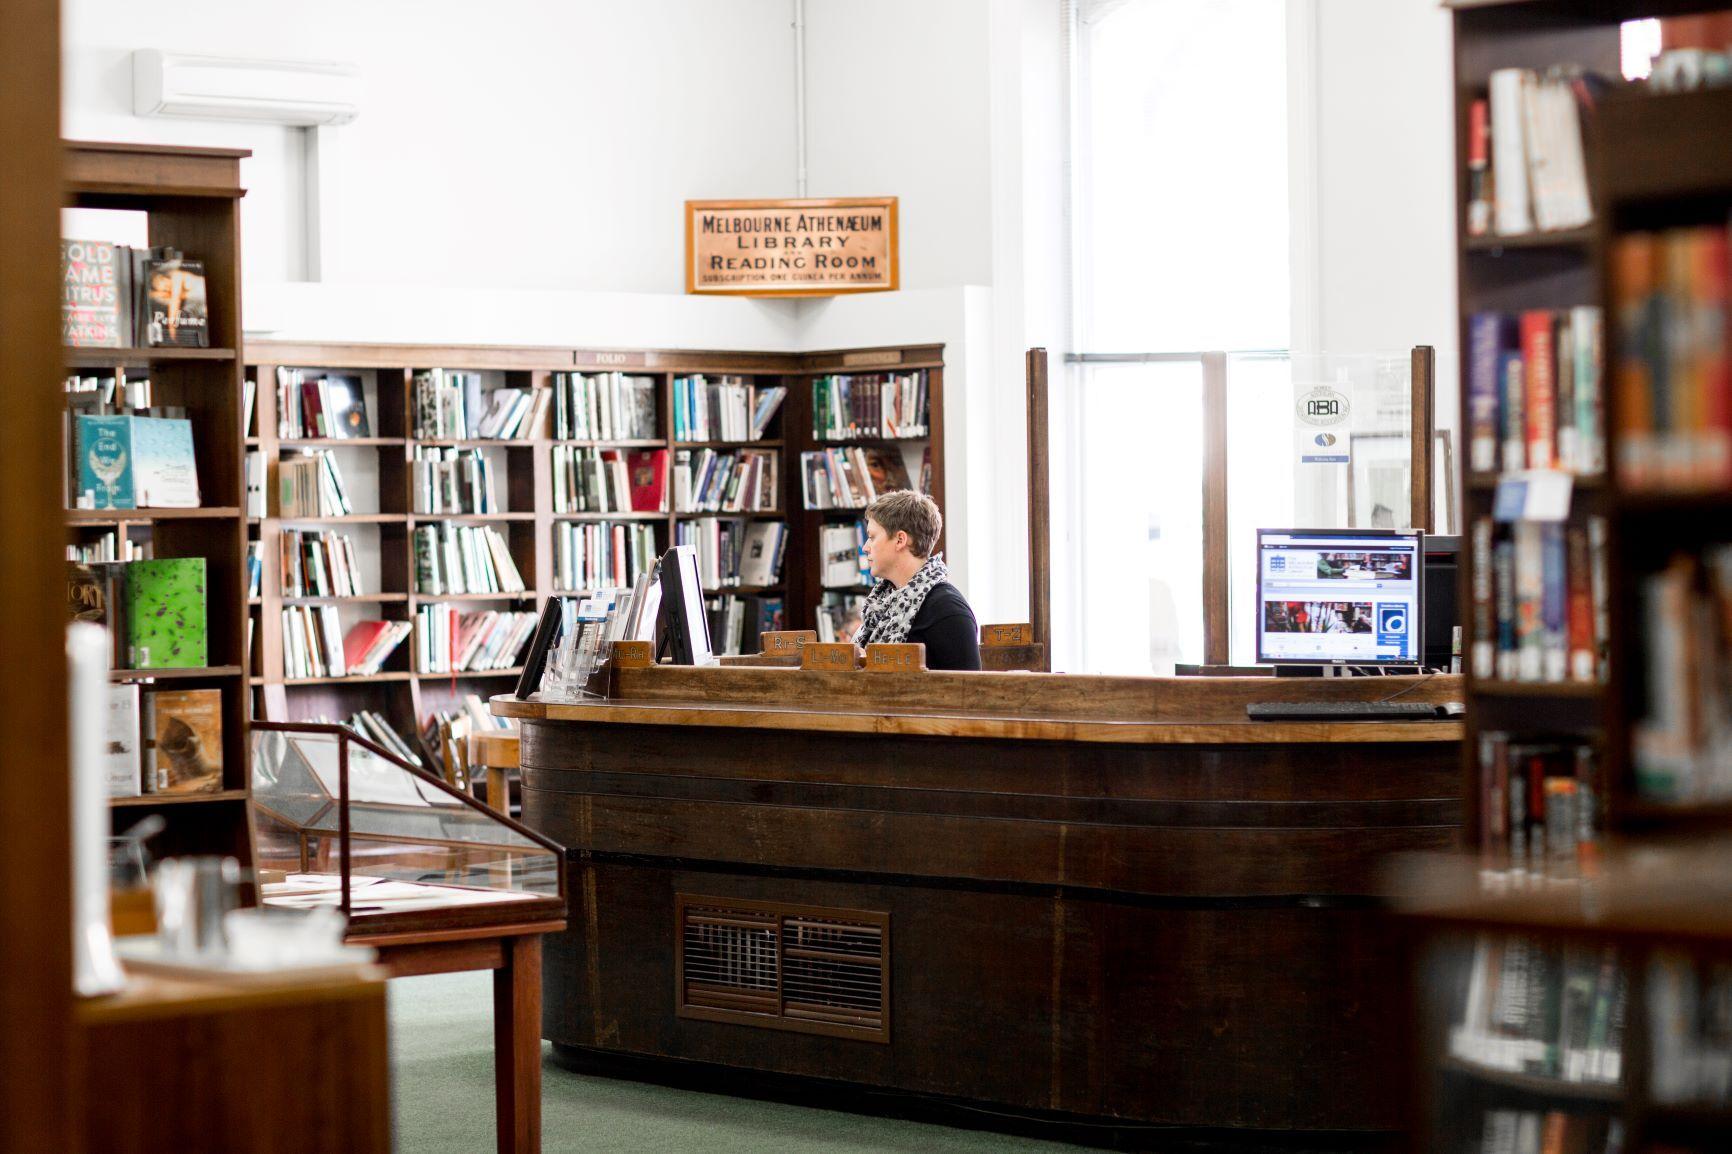 Melbourne Atheneaum Library